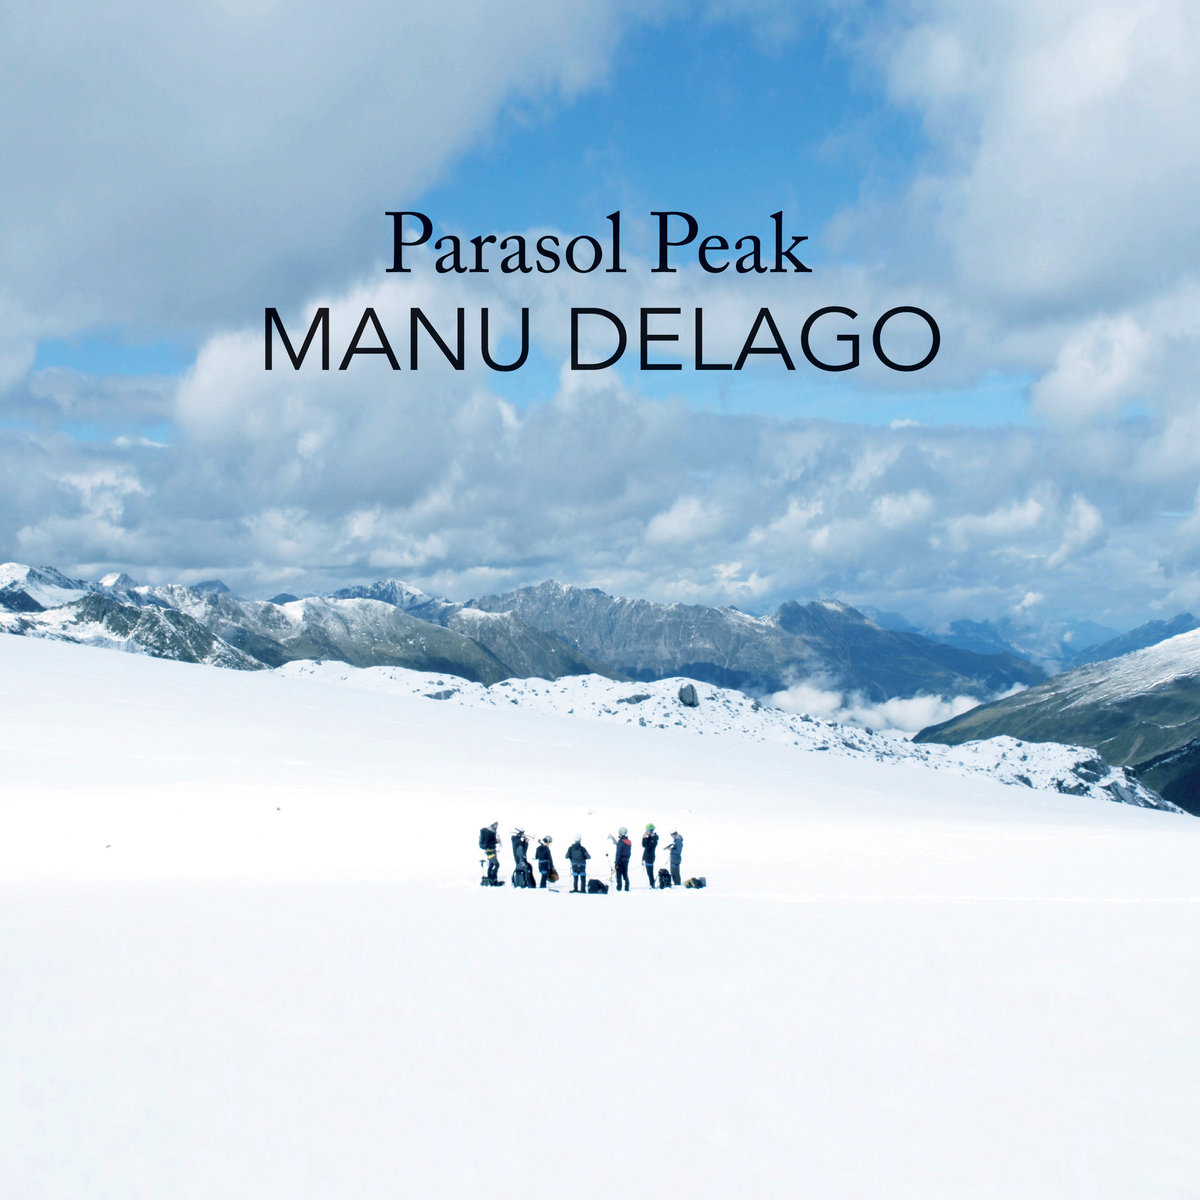 Parasol Peak (2018) - One Little Indian Records 2018Album & FilmWatch trailer